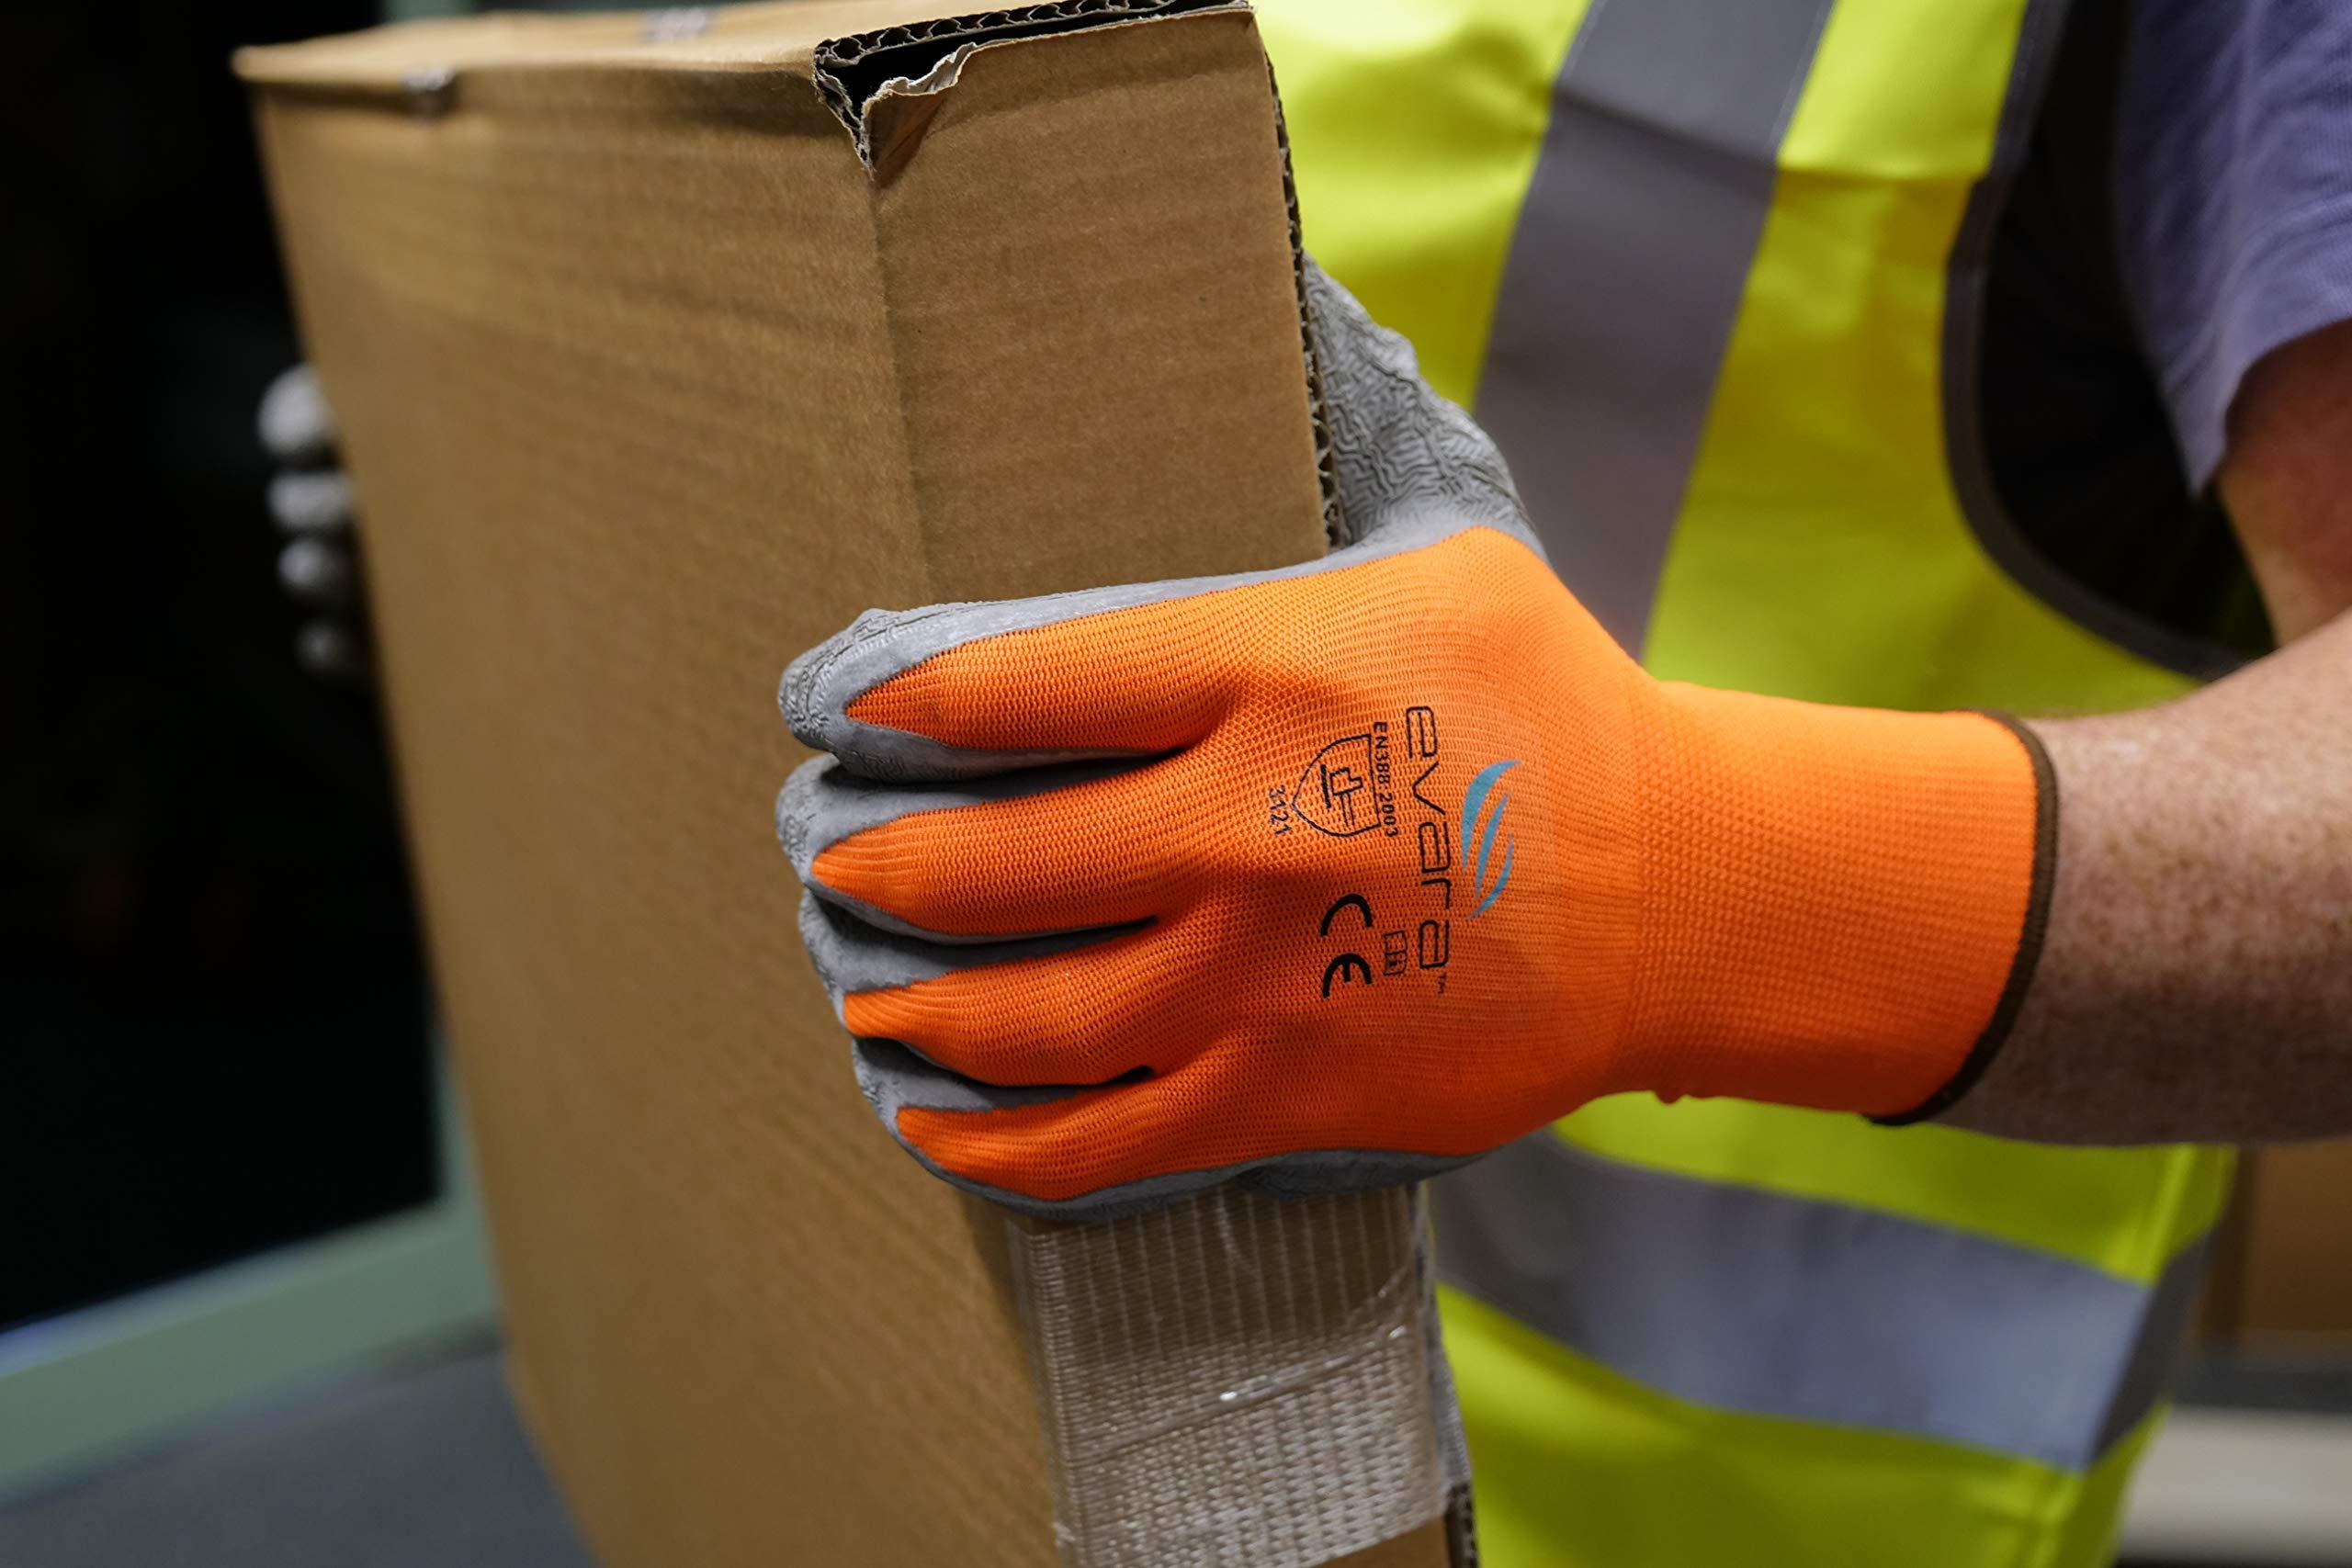 Tough Work and Gardening Gloves for Men and Women(12 pairs per pack) (Latex, Medium) Supreme Hi-vis orange with full thumb dipping by Evara by Evara (Image #3)